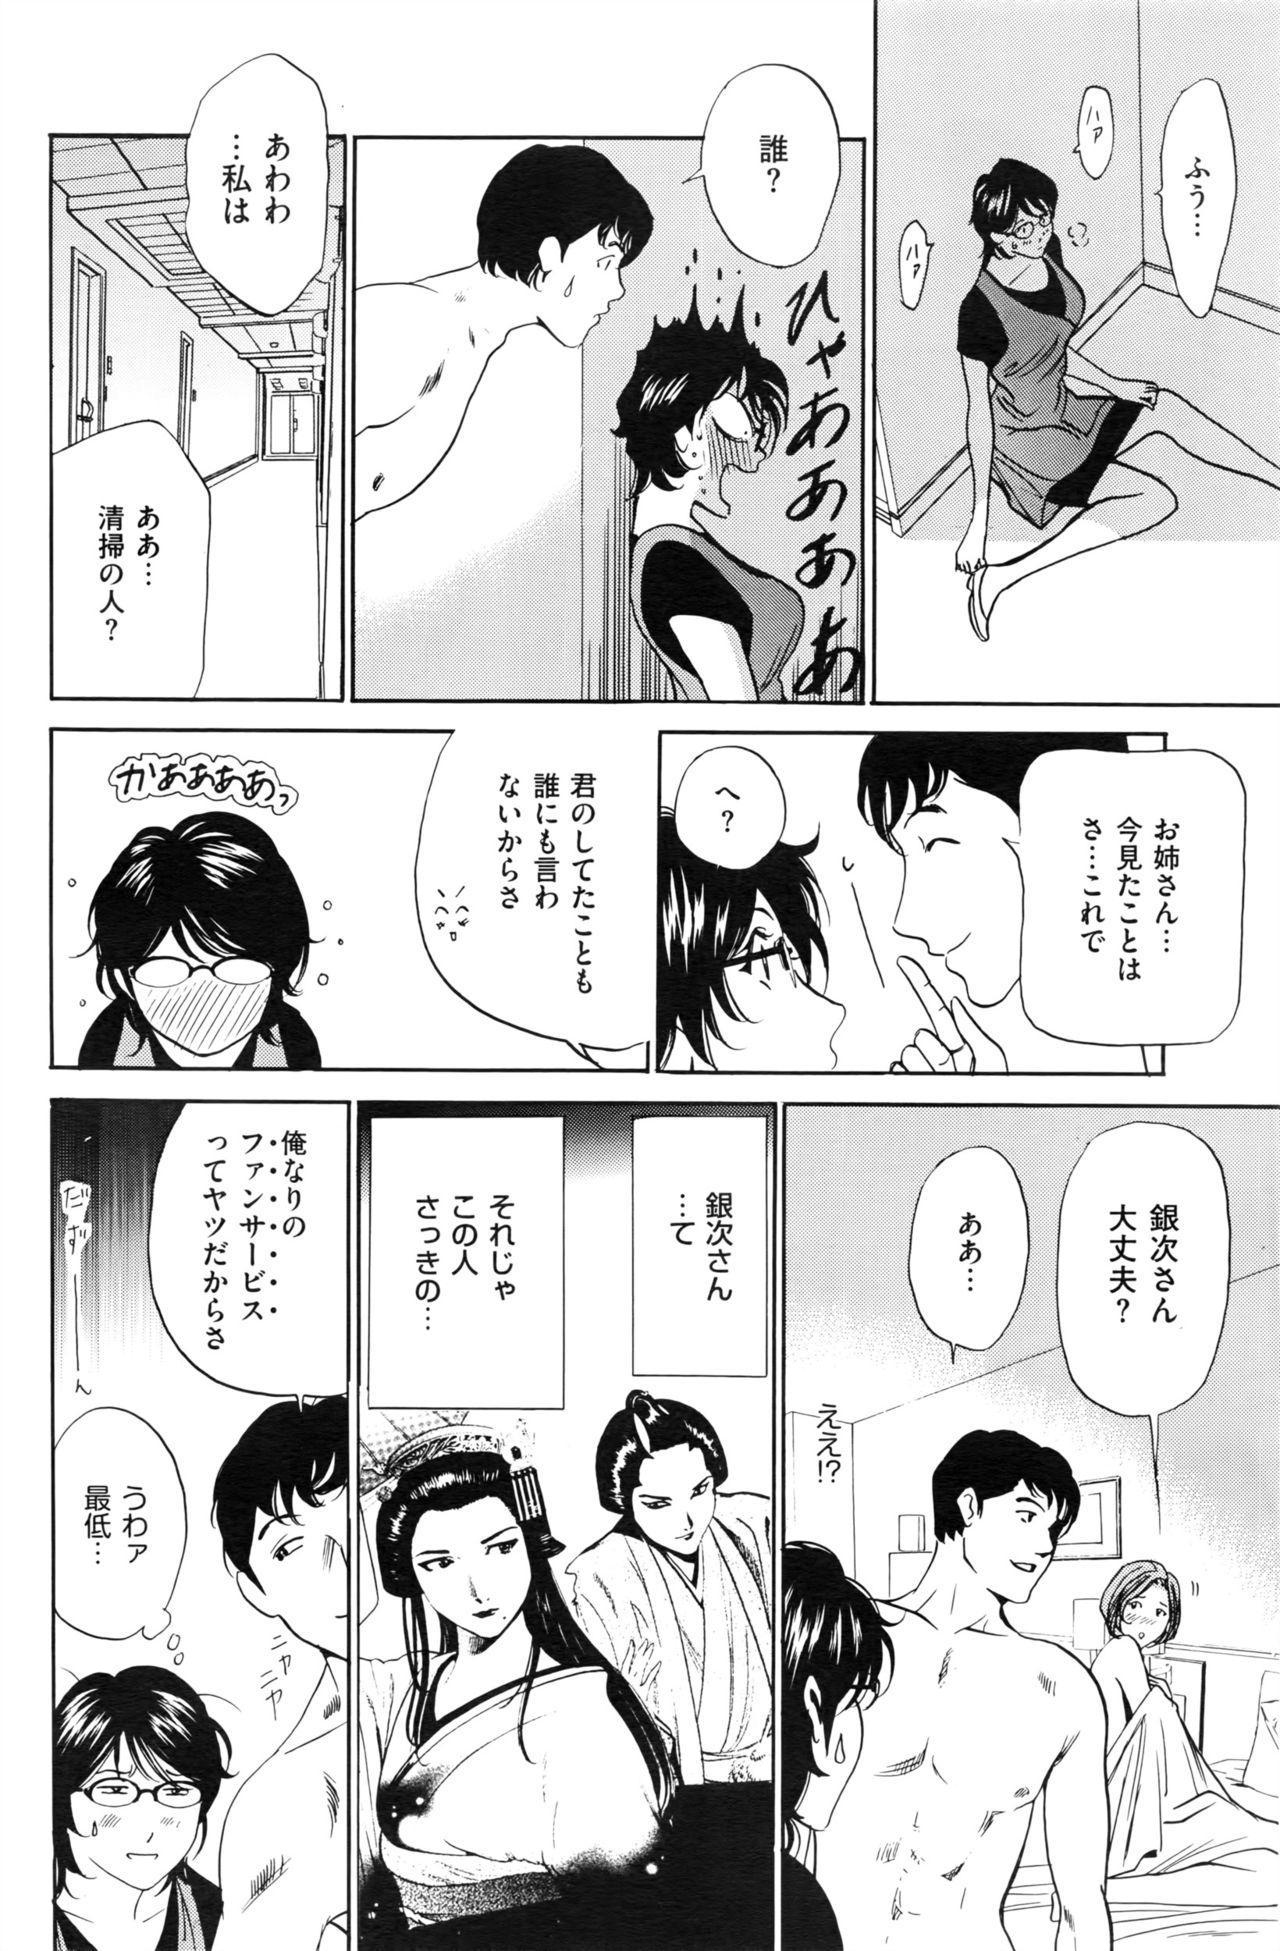 Wa Usuki Ipa a 1-10 62